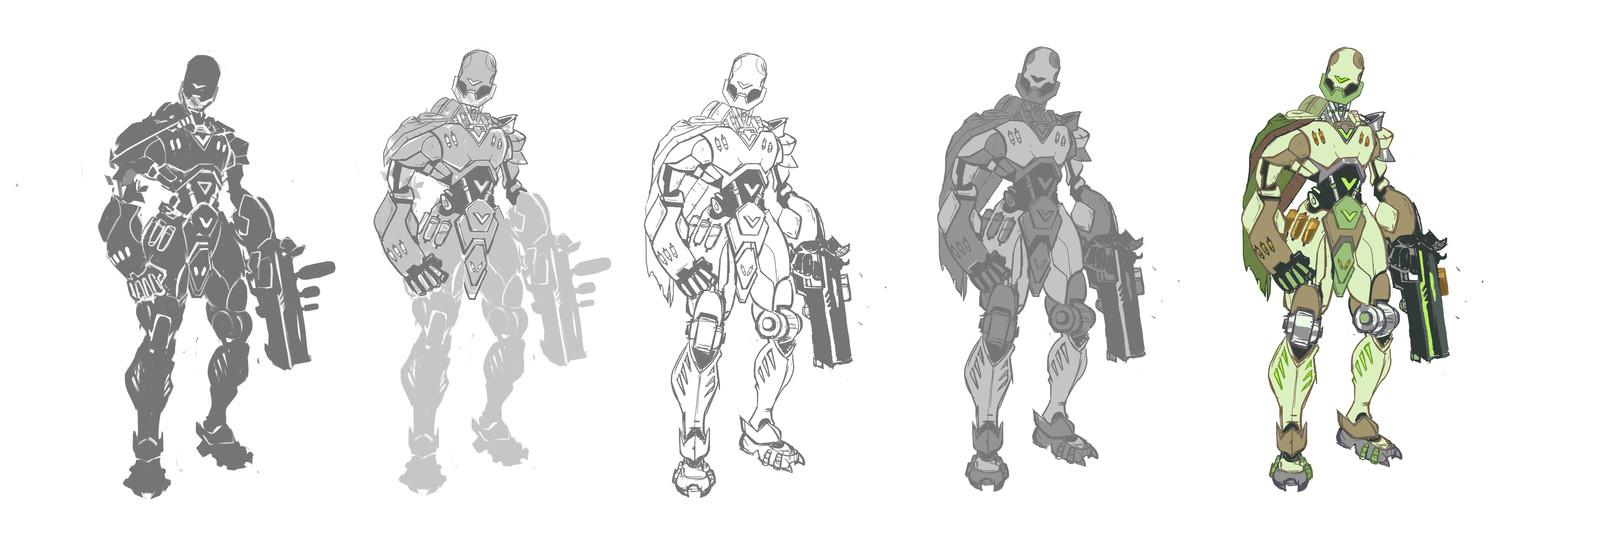 overwatch concept